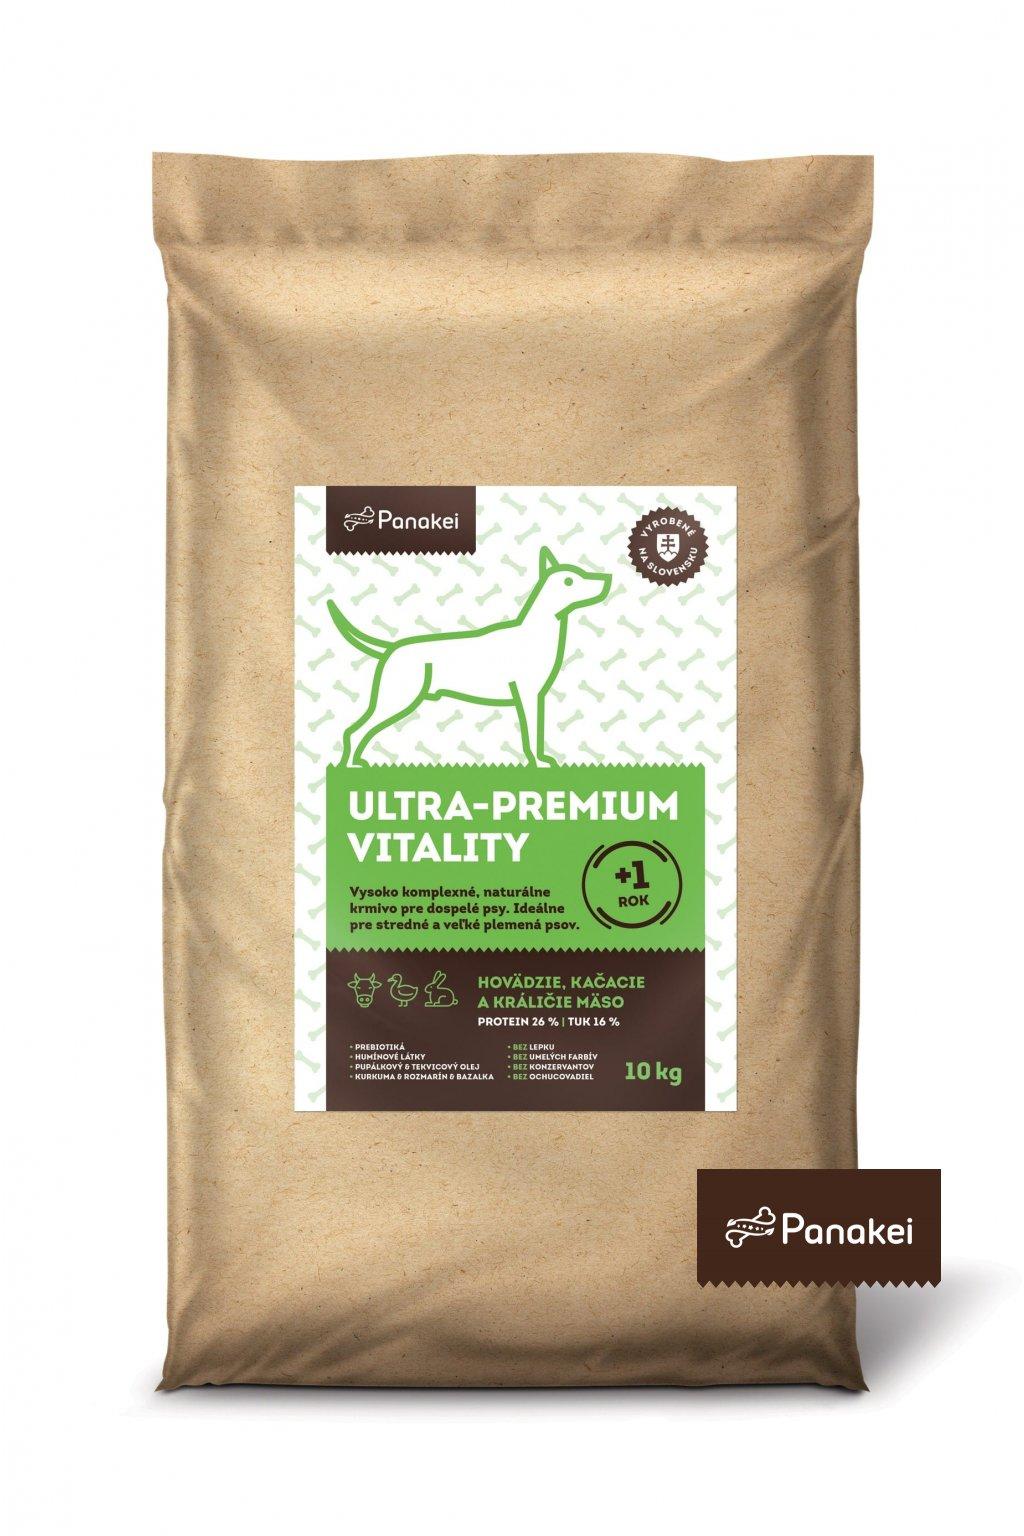 Pack2 ULTRAPREMIUM VITALITY Dospely pes M+L+XL 10kg 2 min (1) min